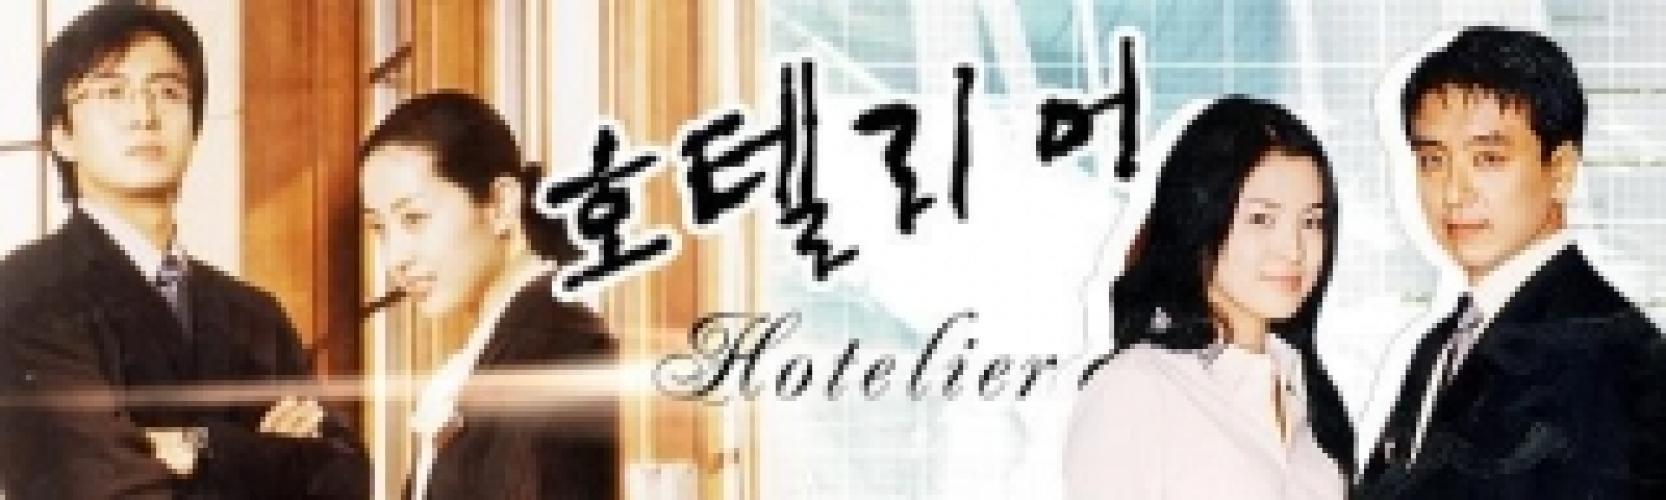 Hotelier next episode air date poster